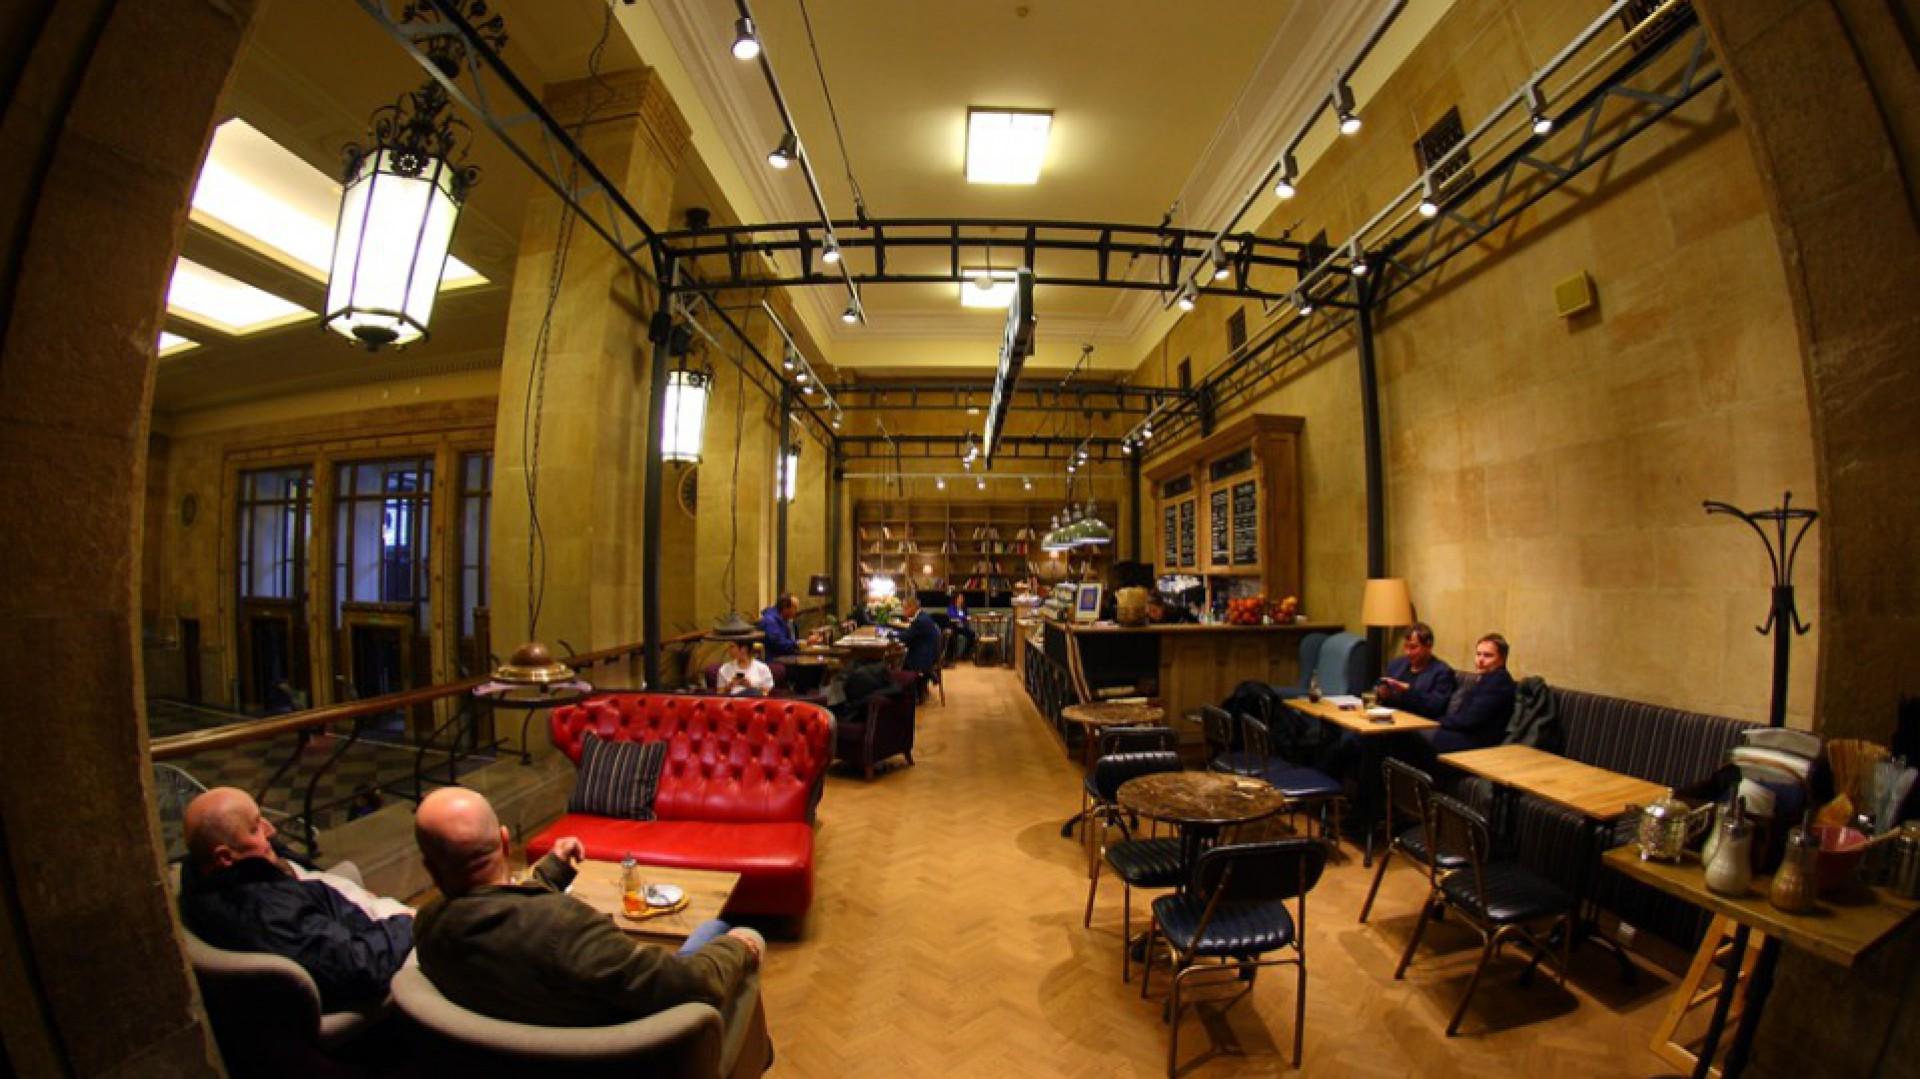 Green Caffe Nero PKiN fot. mat. prasowe